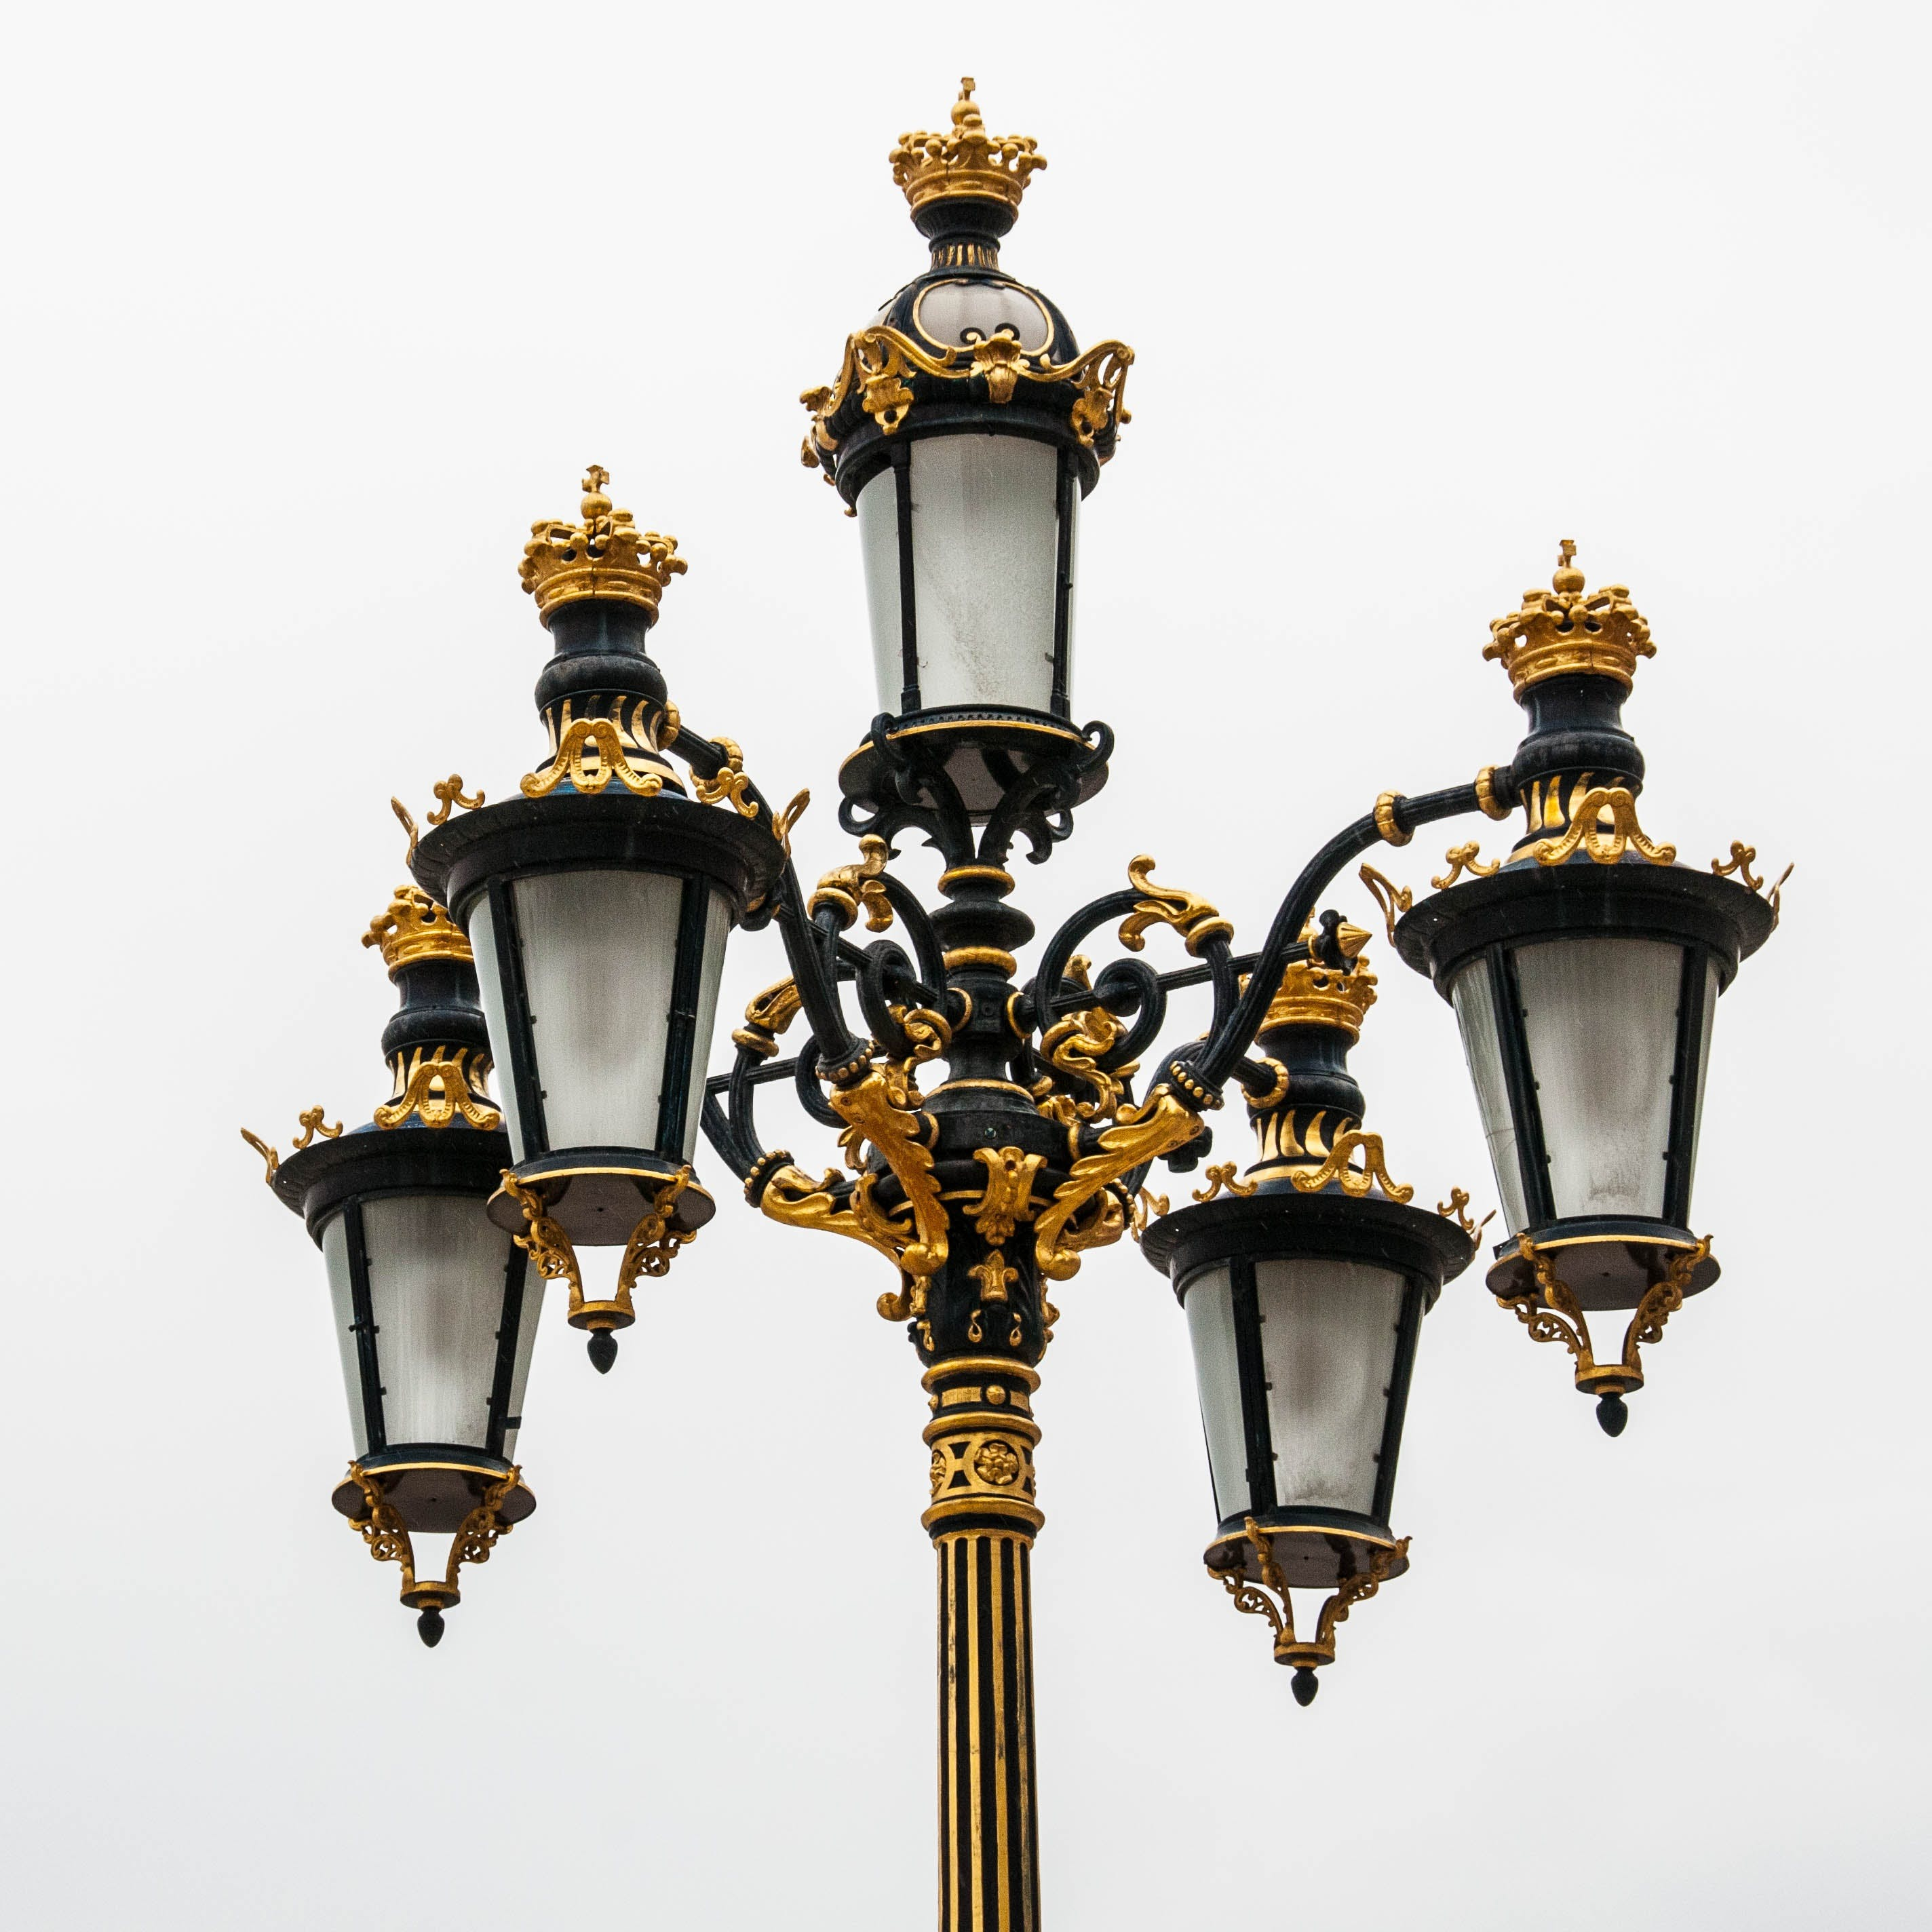 Free stock photo of lamp, lantern, golden, street lamp